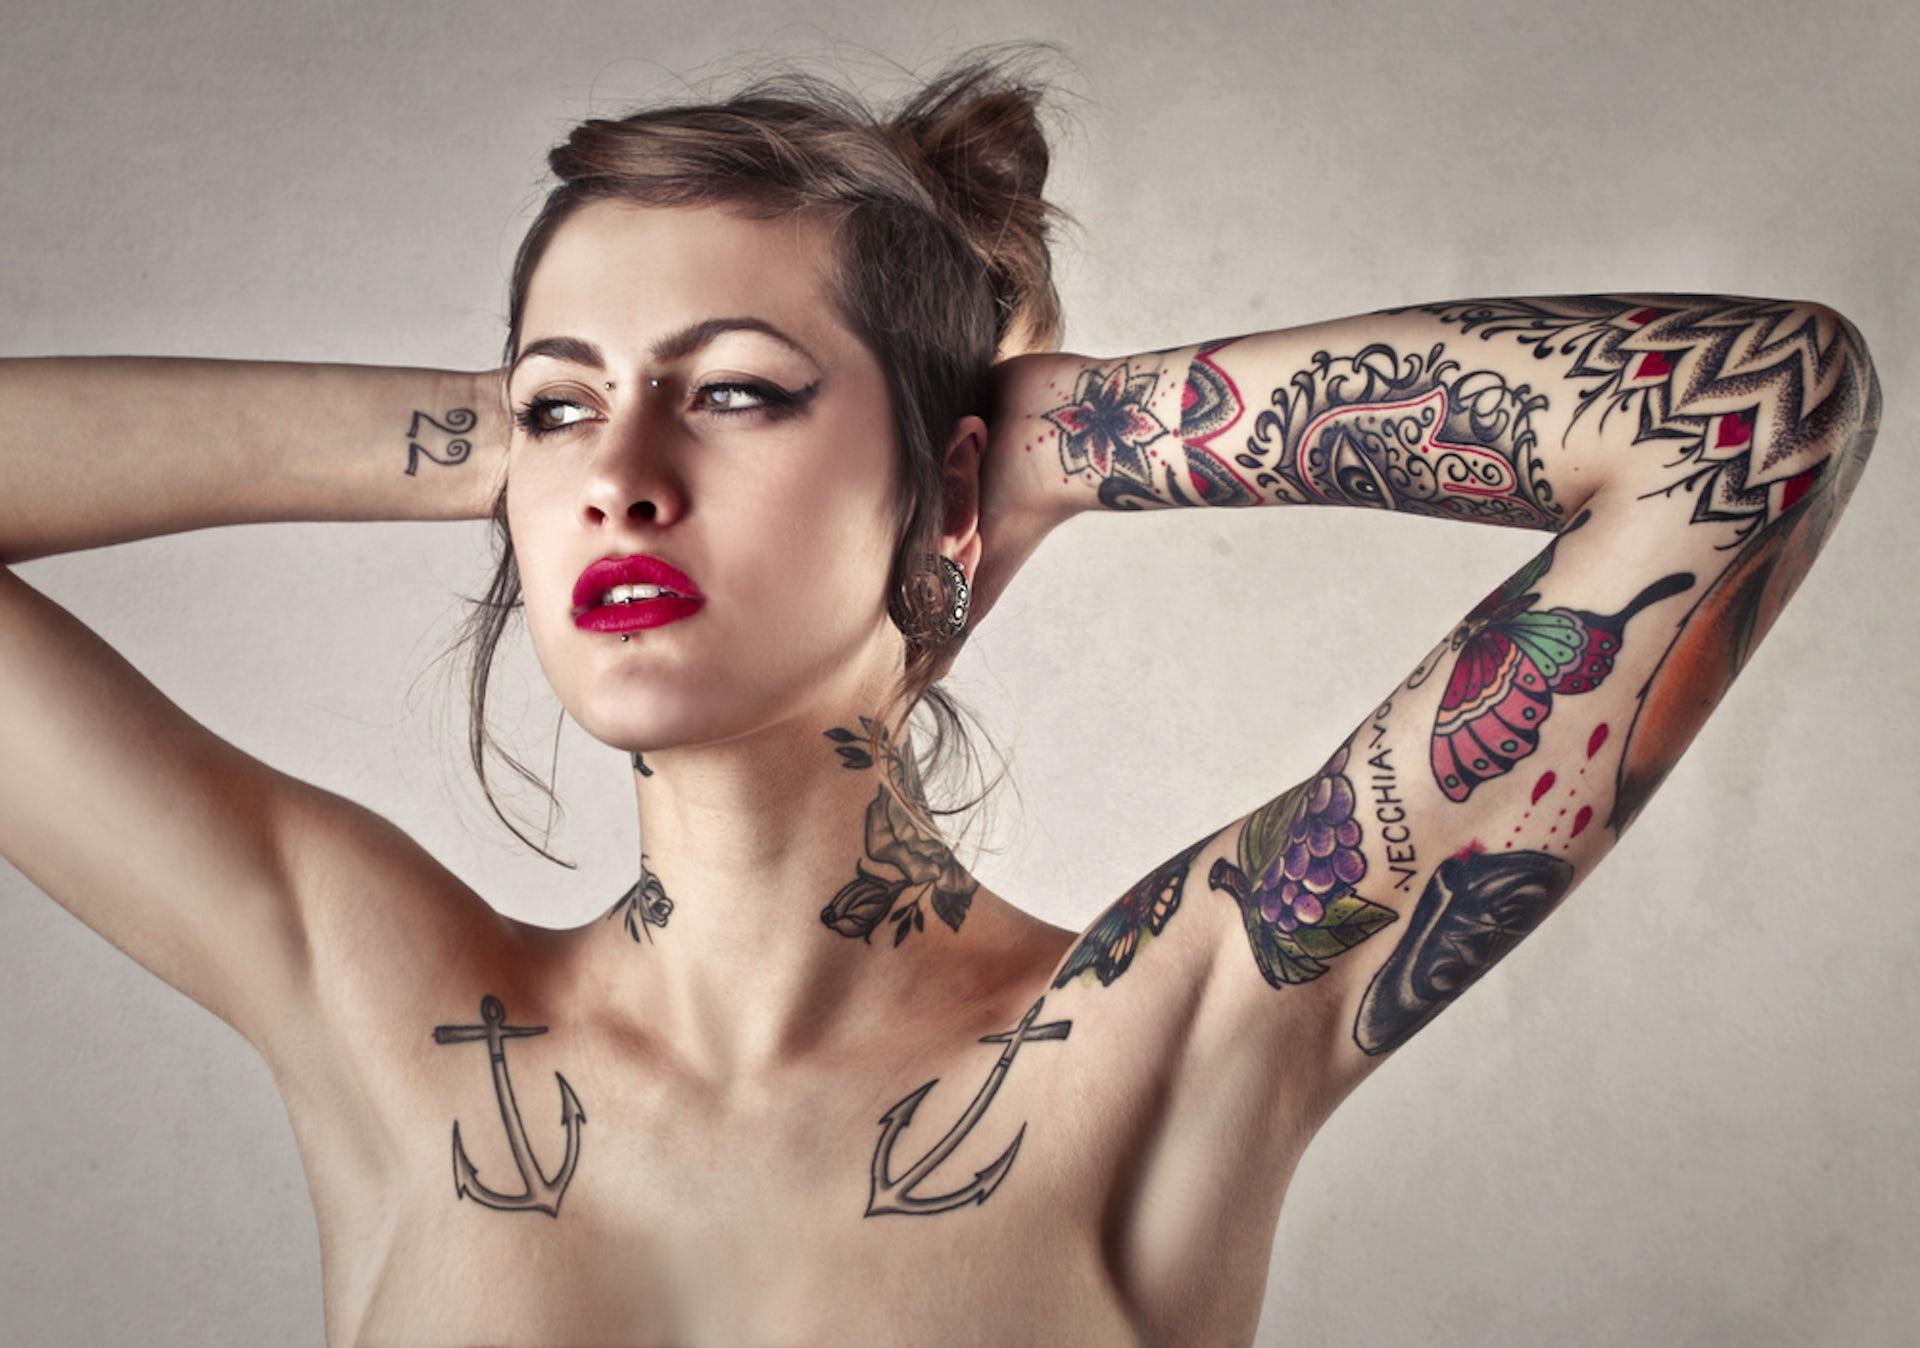 Images - Nude genital tattooed woman